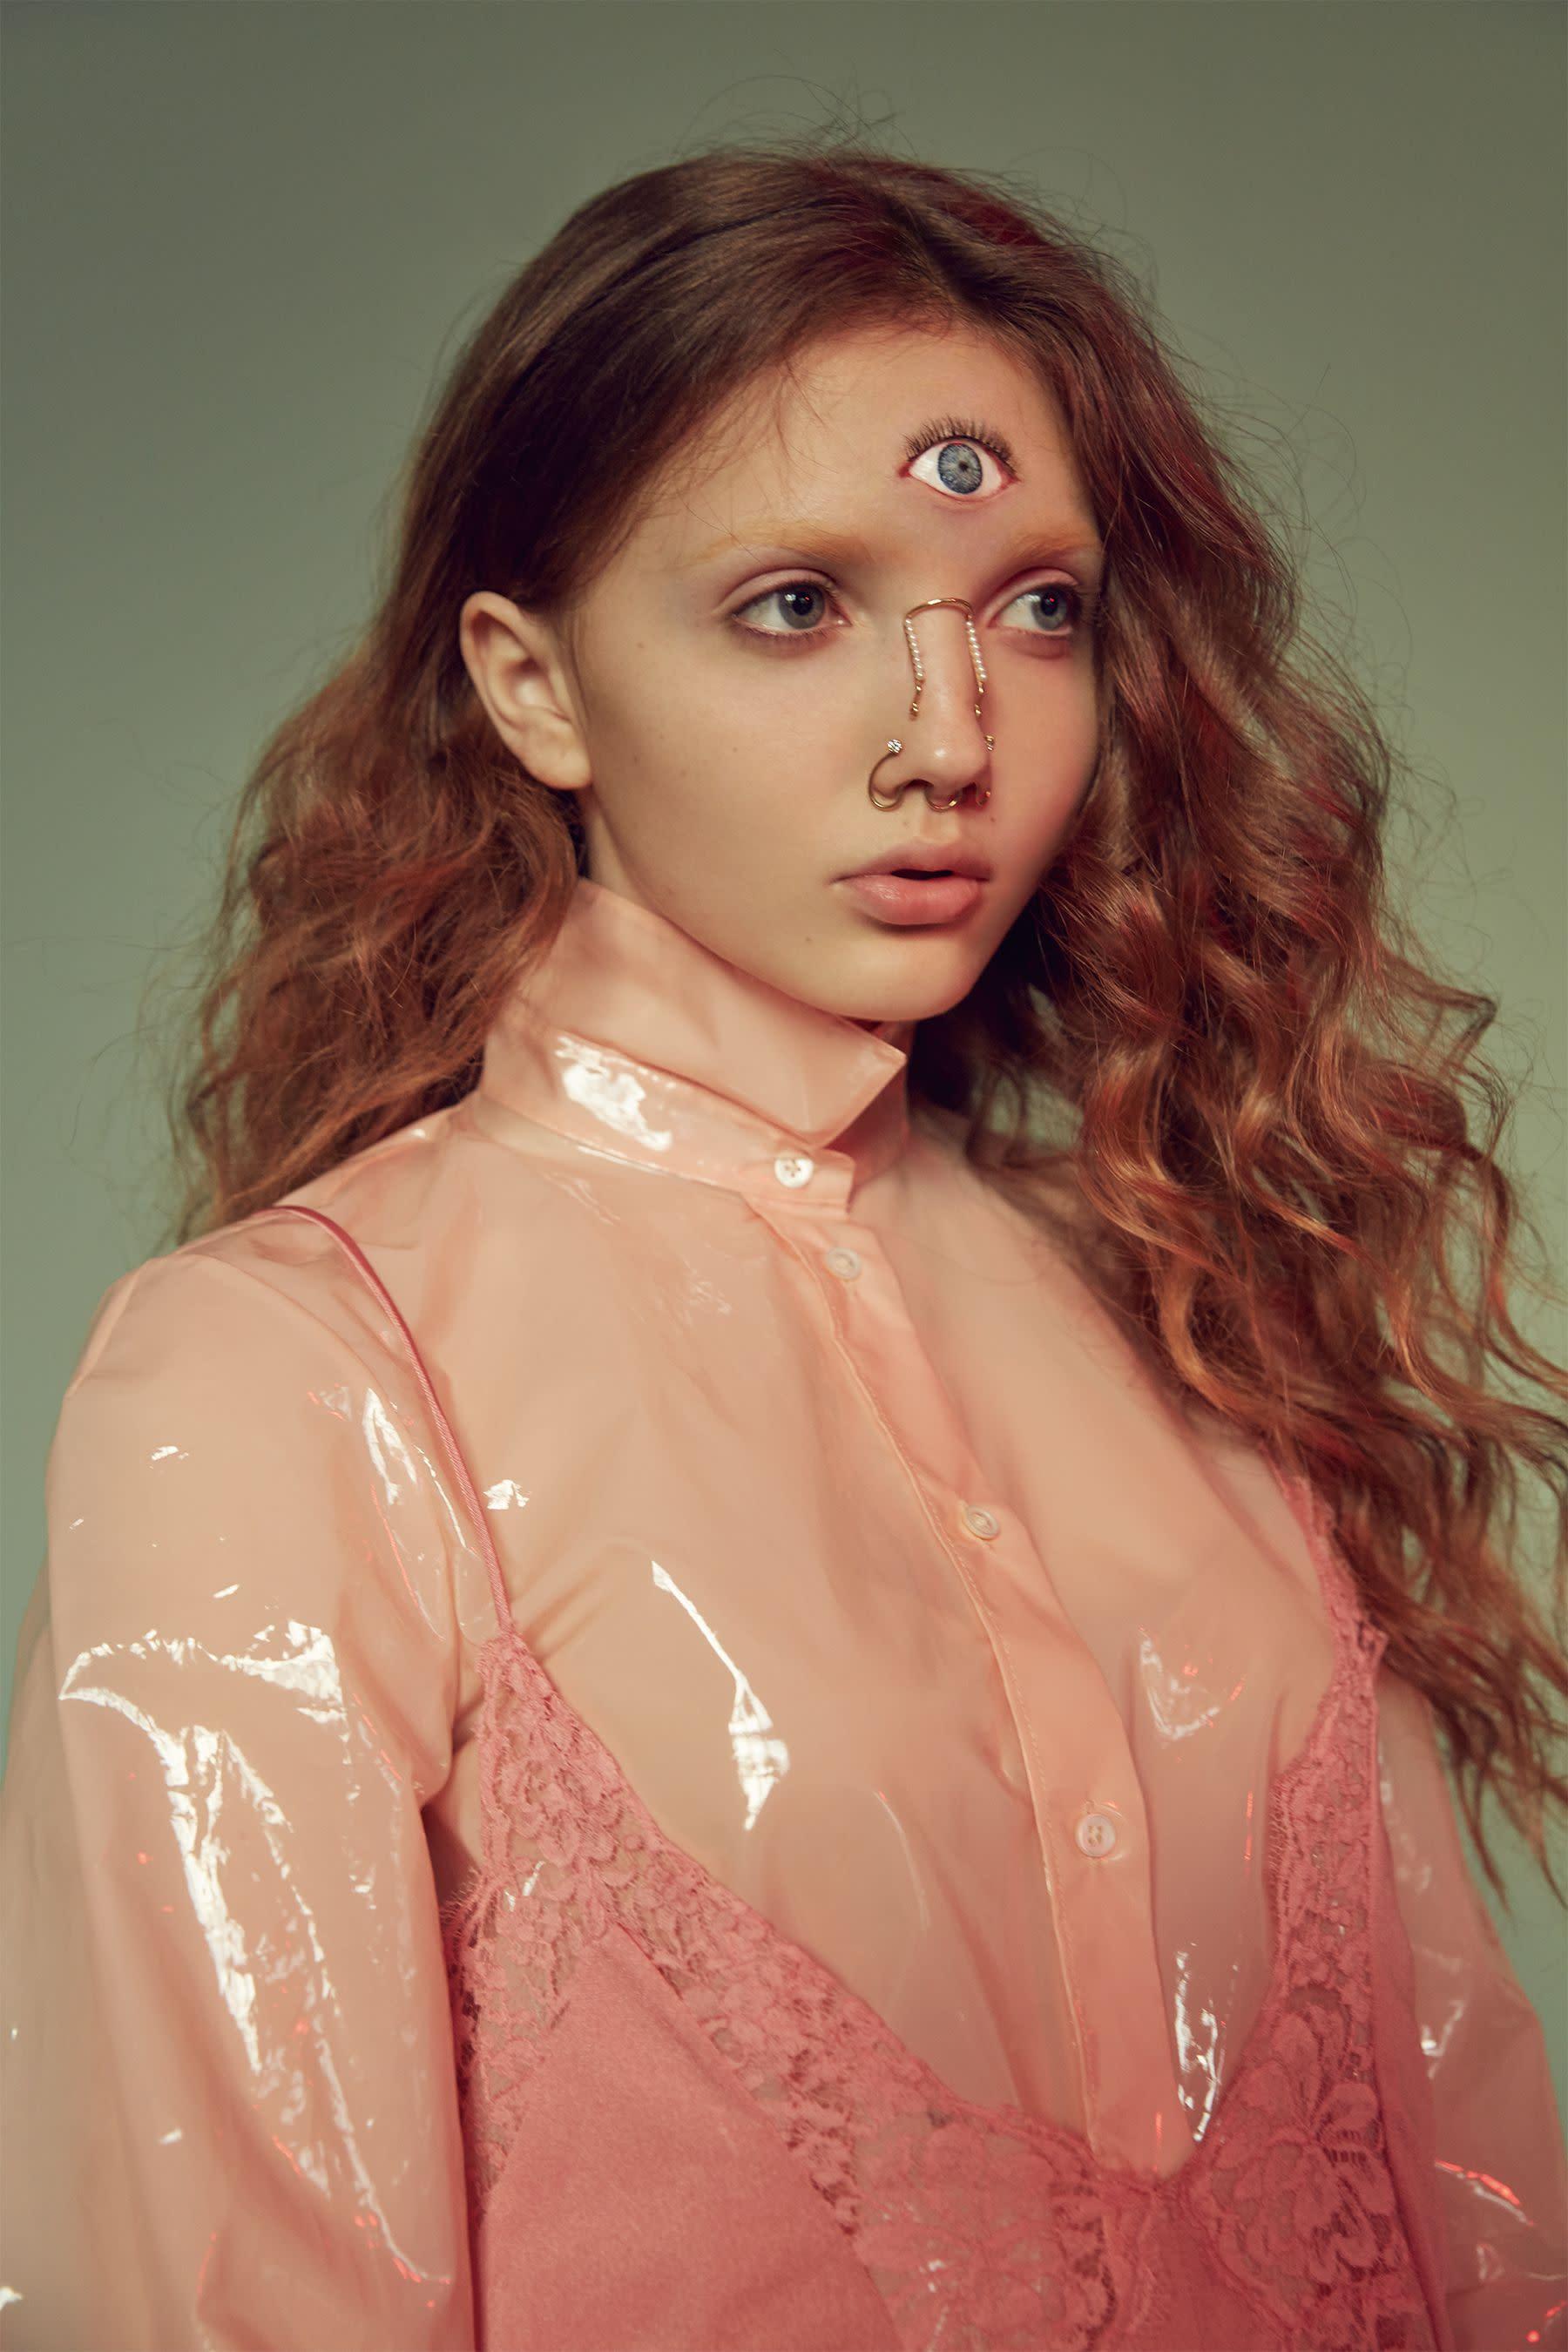 塑料襯衫,Jil Sander at Art Haus;蕾絲洋裝,Stella McCartney;飾品,Joanne T。